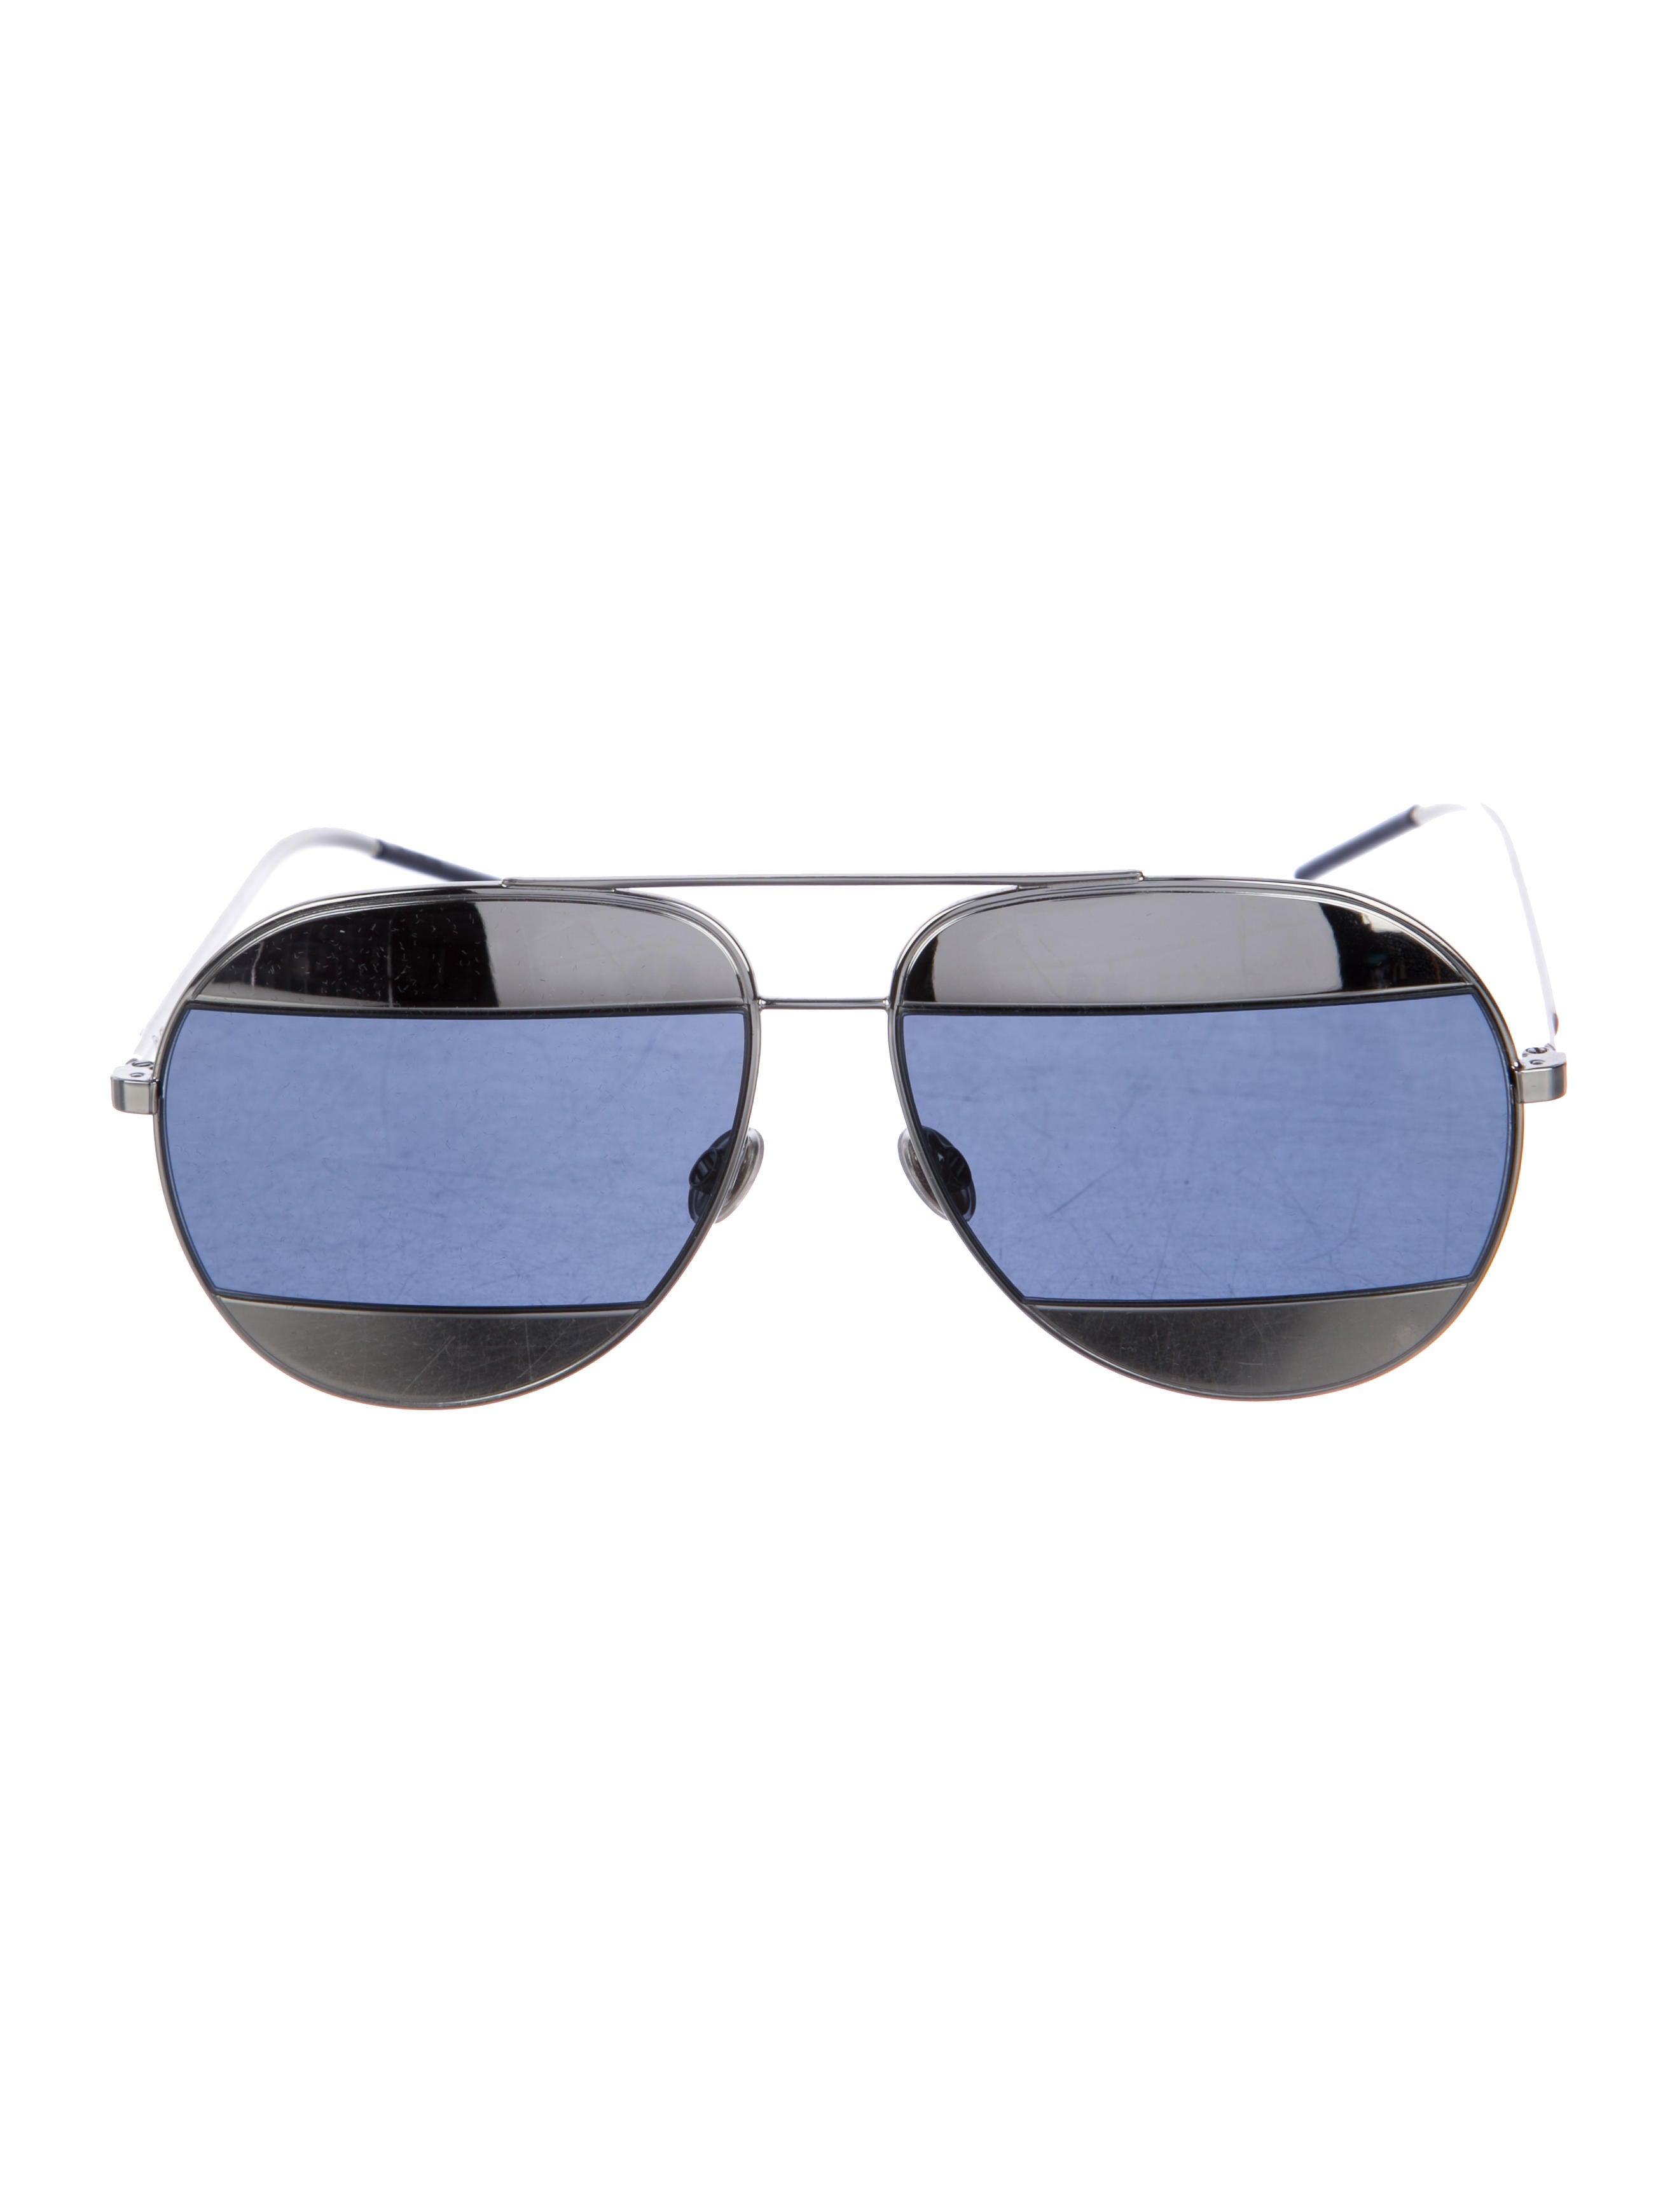 97e4b7358539 Christian Dior Split 1 Tinted Sunglasses w  Tags - Accessories ...